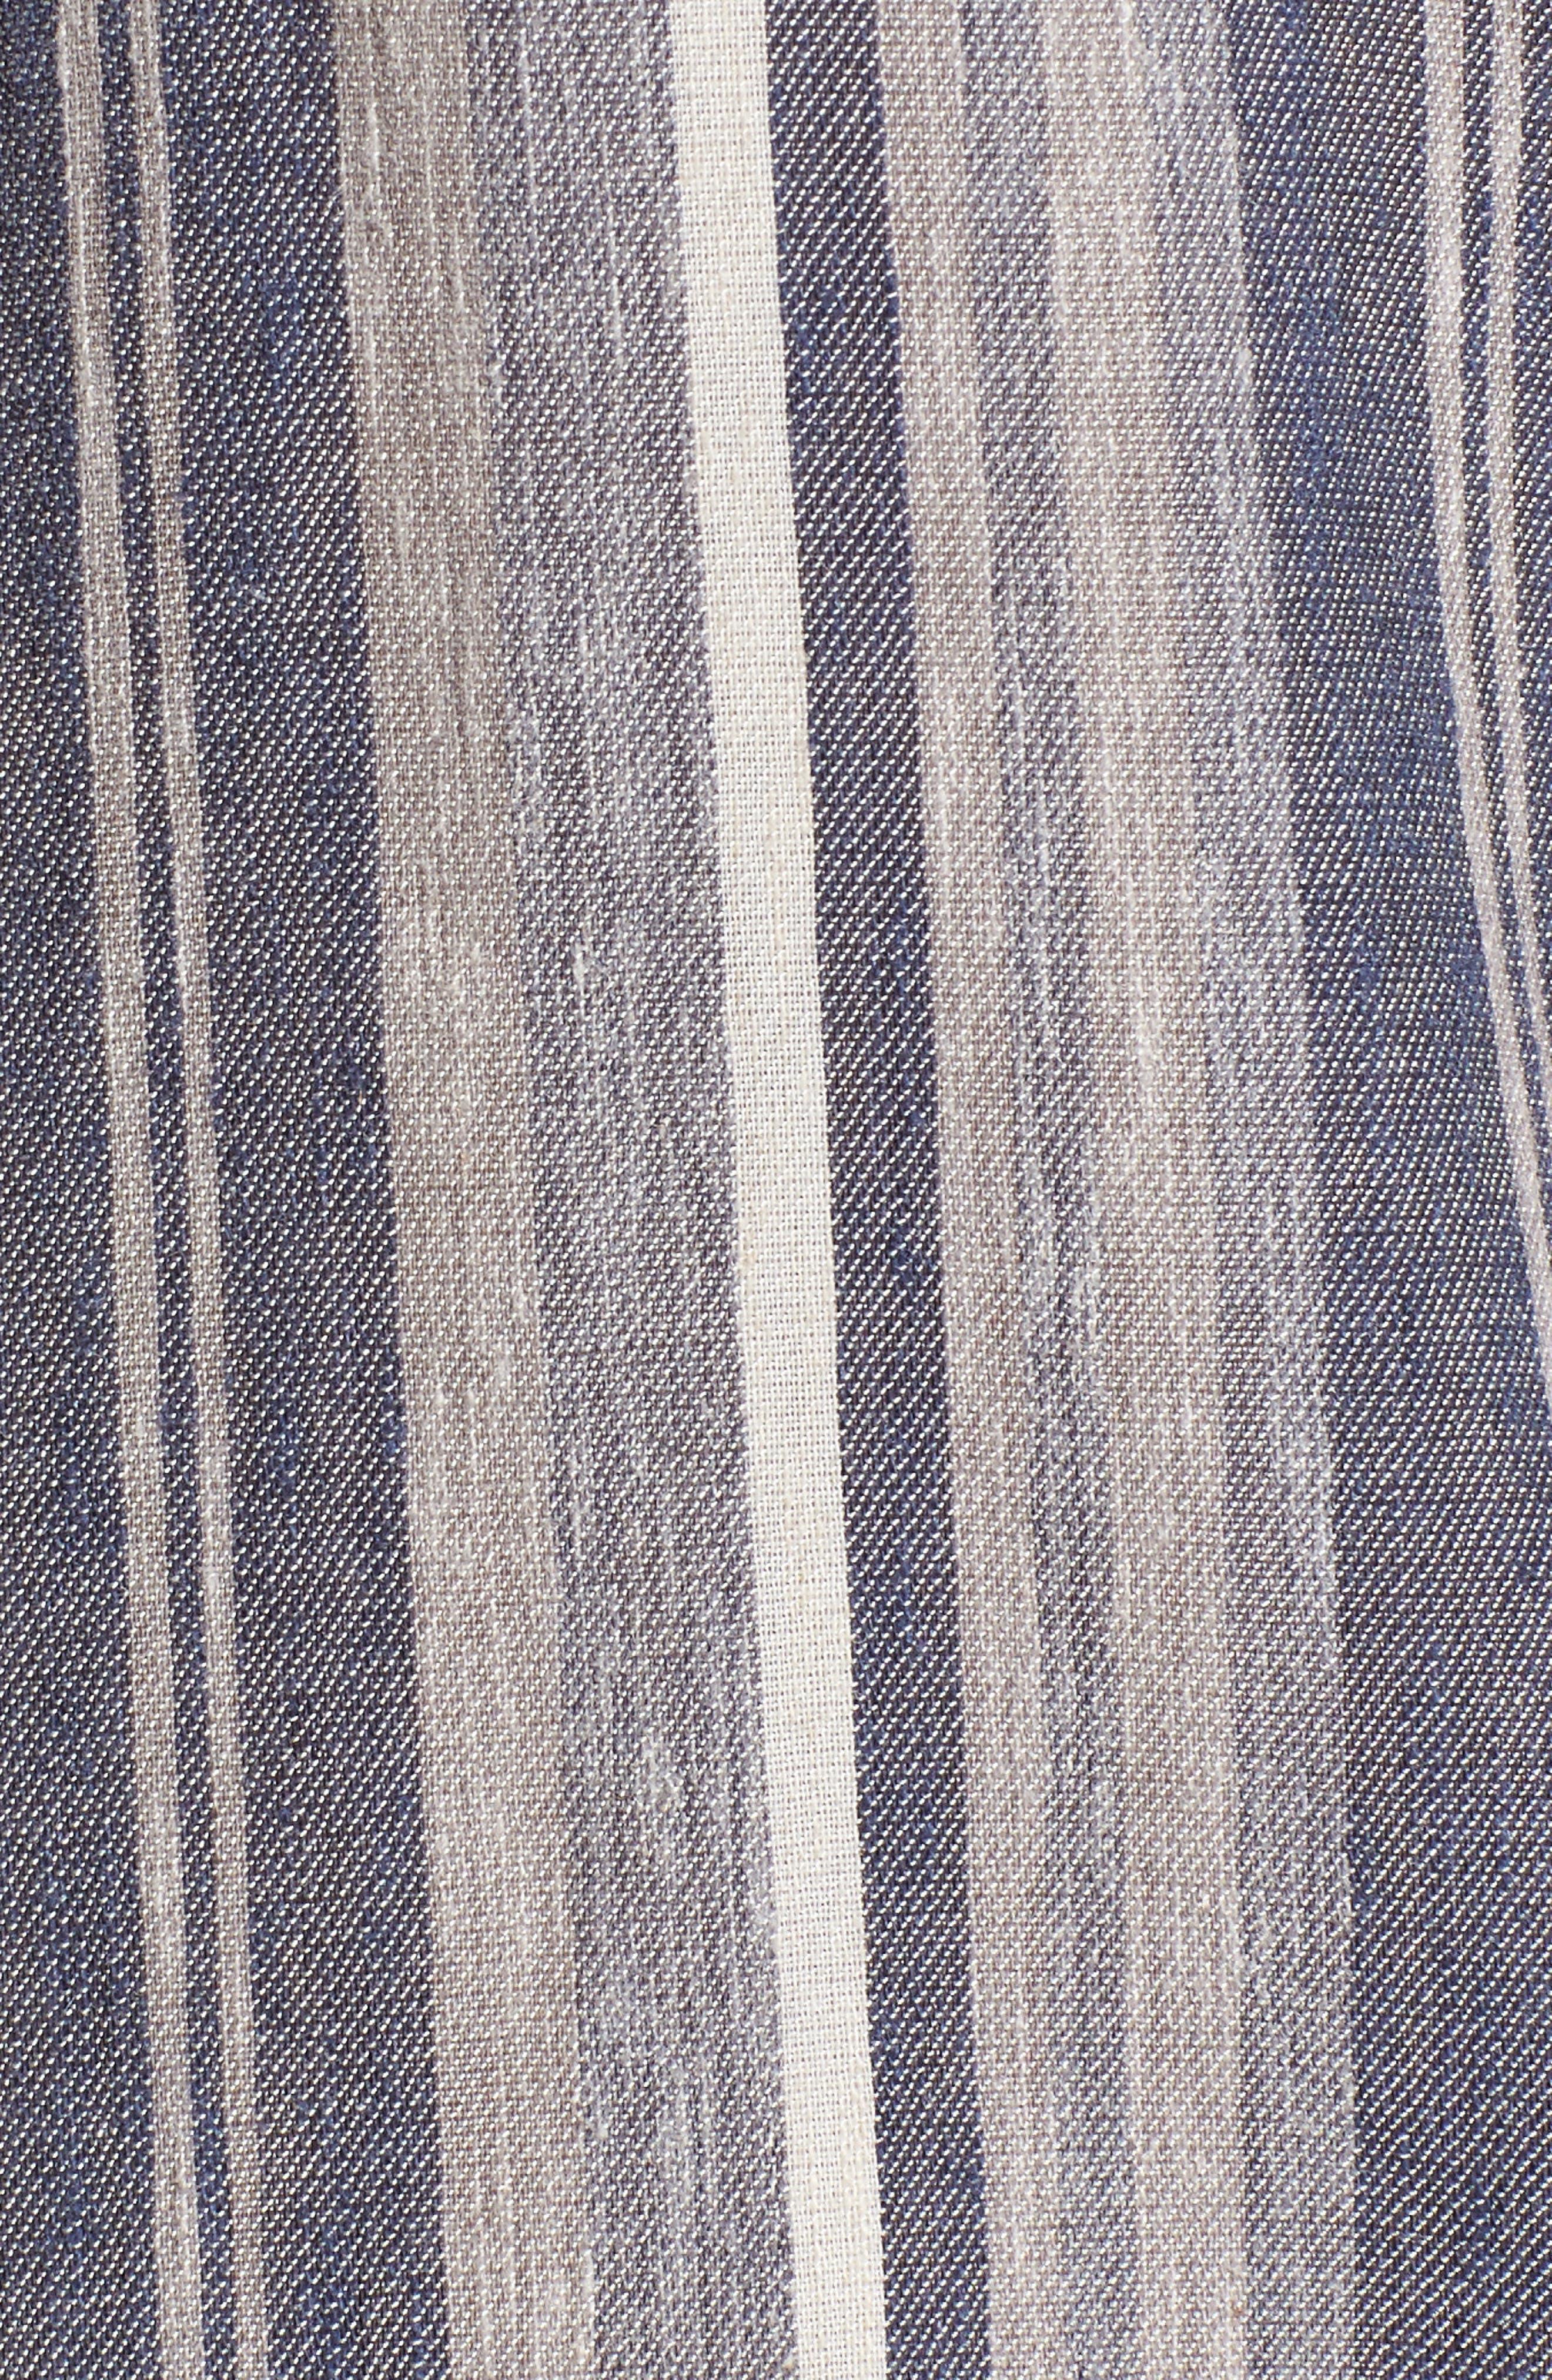 Stripe Chambray Shirt,                             Alternate thumbnail 5, color,                             466